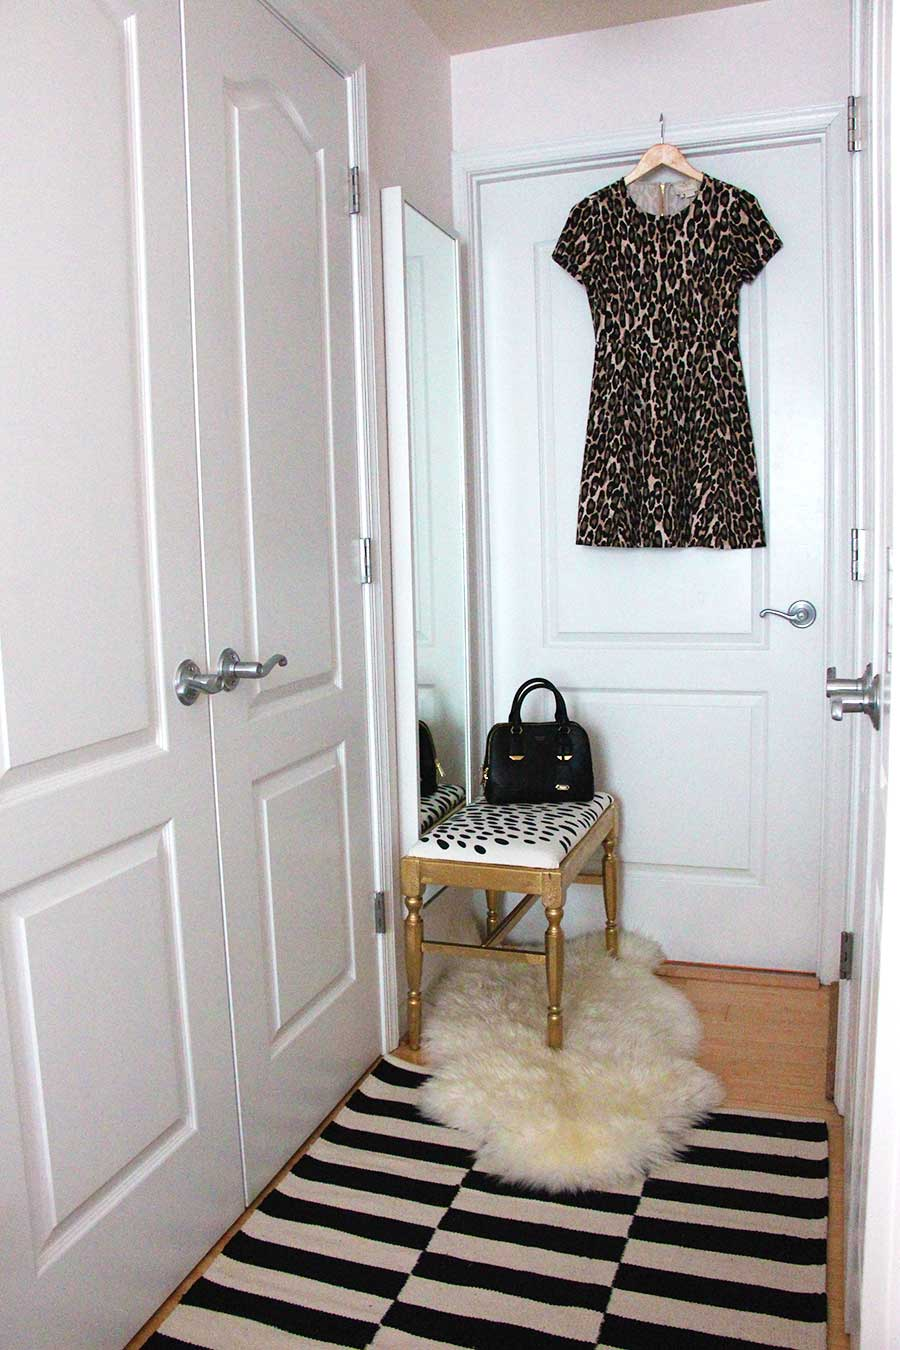 closet-styling-blush-walls-black-and-white-chic.jpg